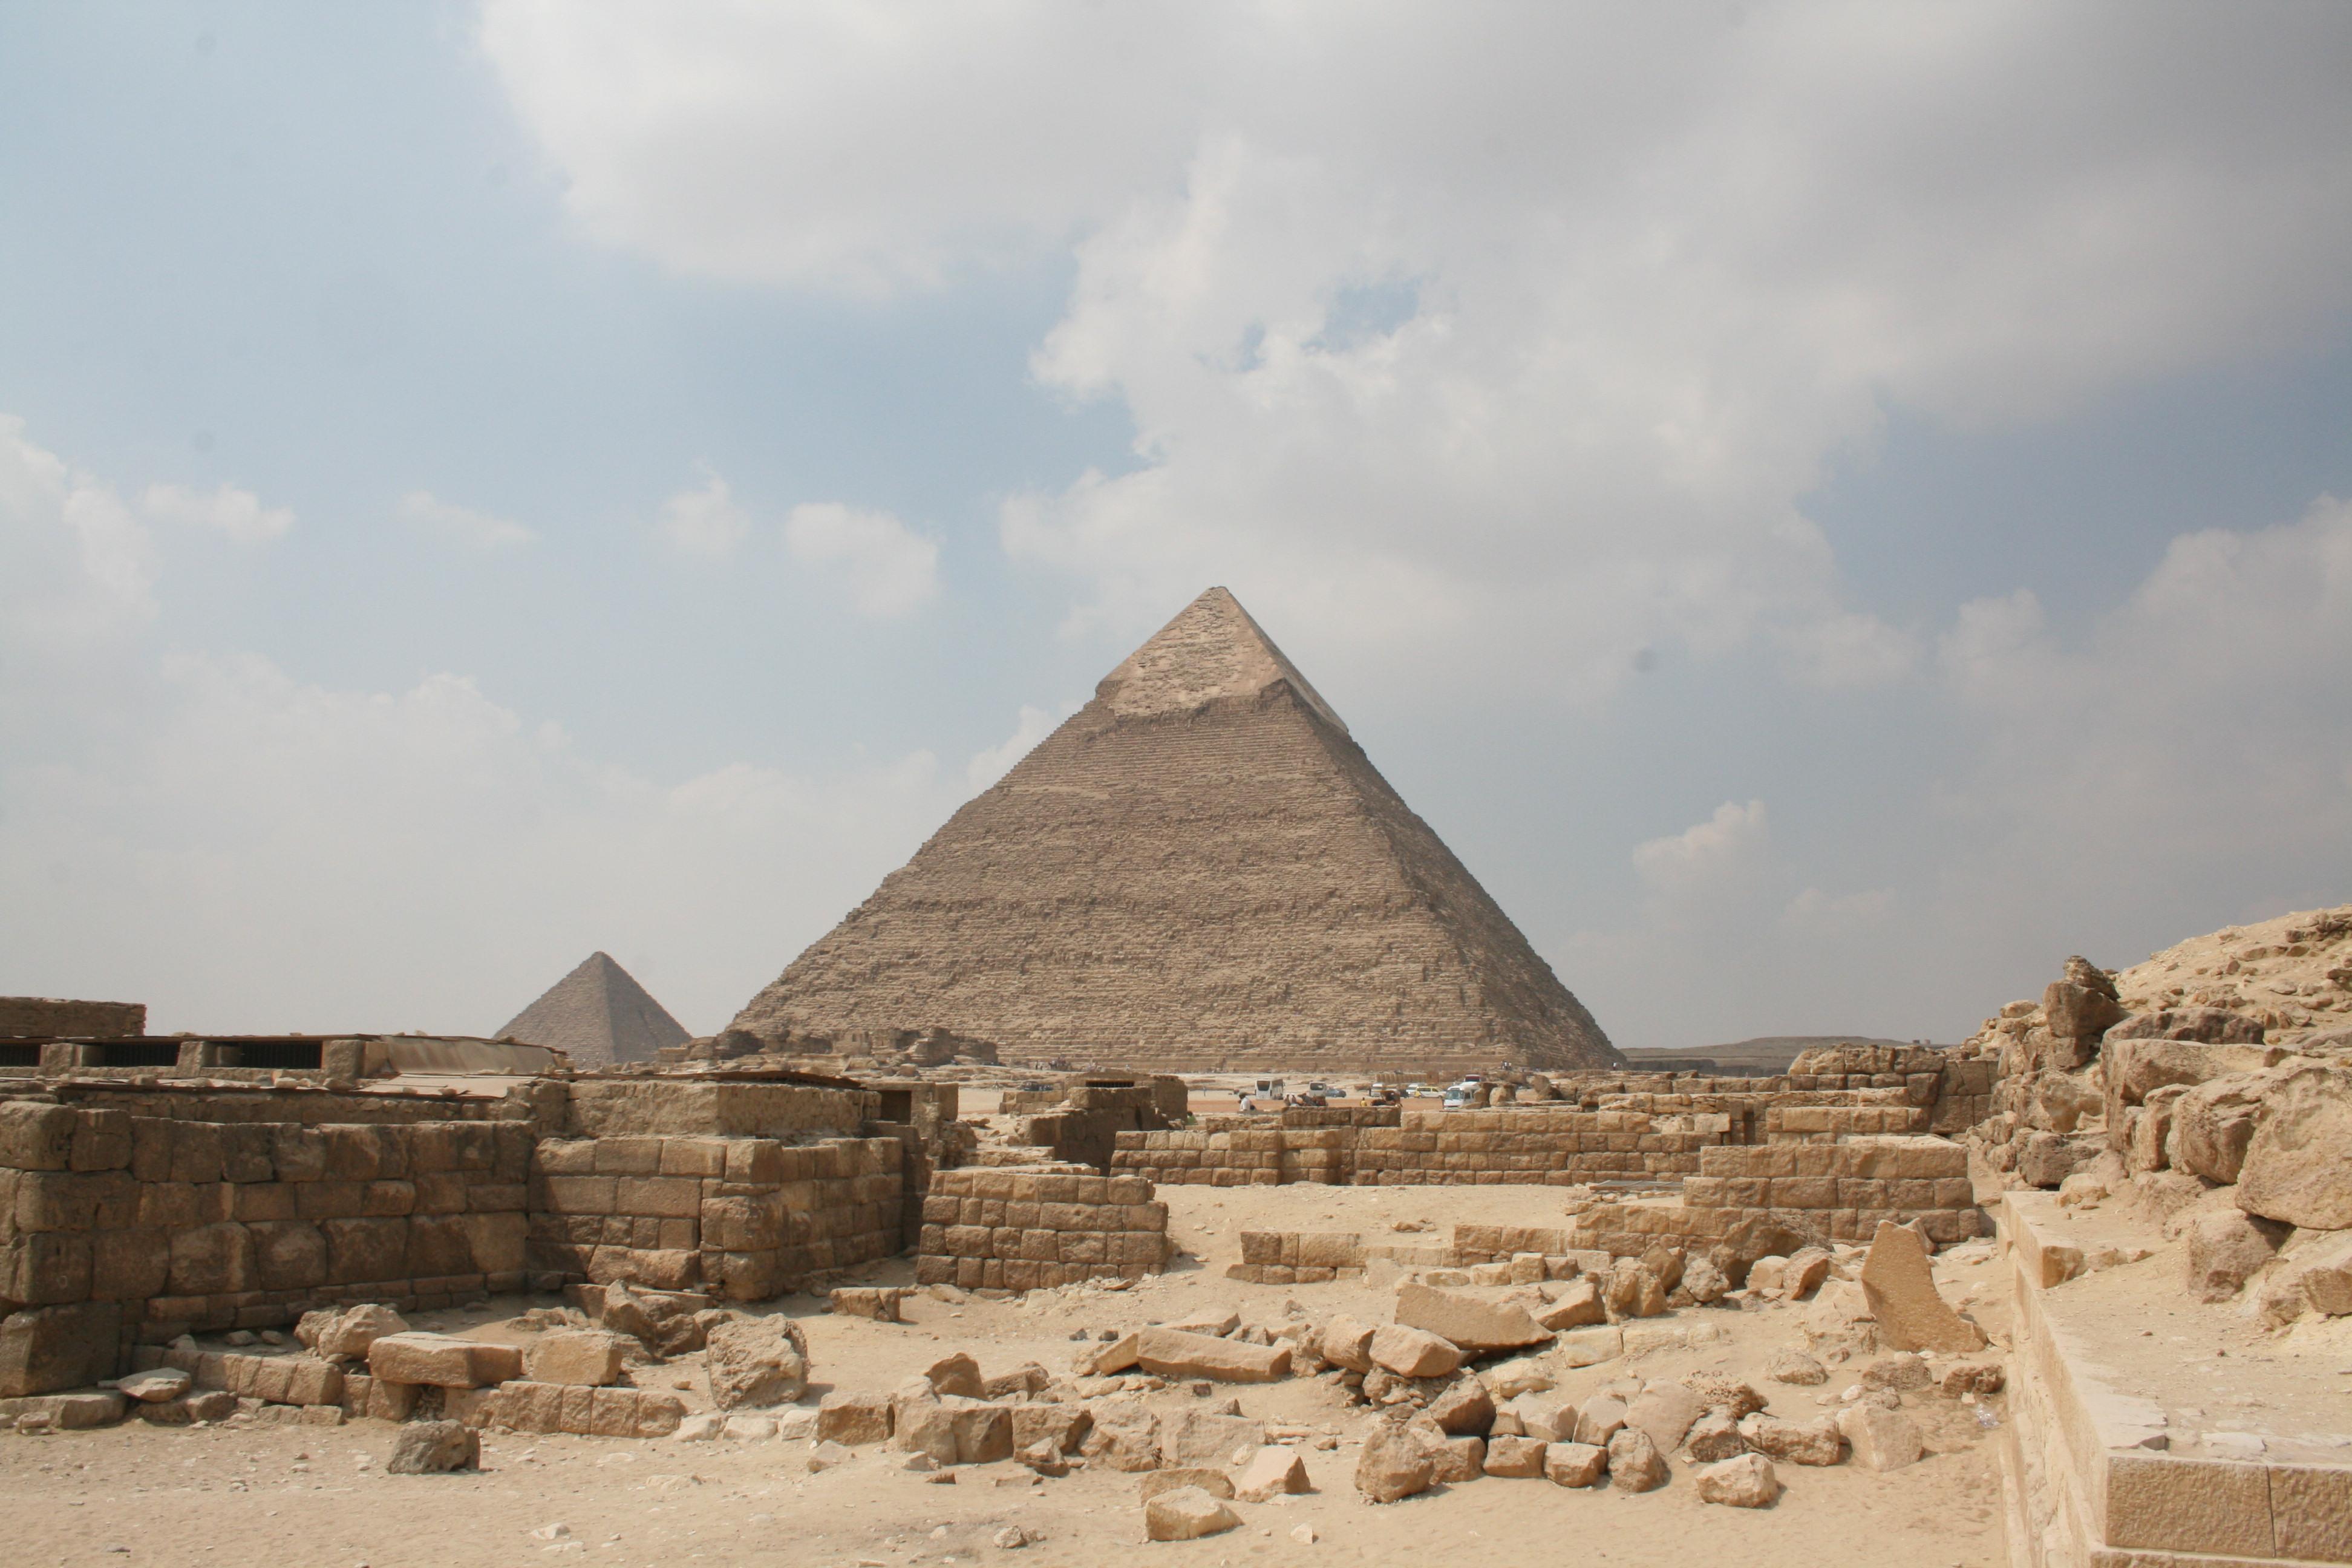 File:Pyramid of Khafre, Giza, Egypt4.jpg - Wikimedia Commons